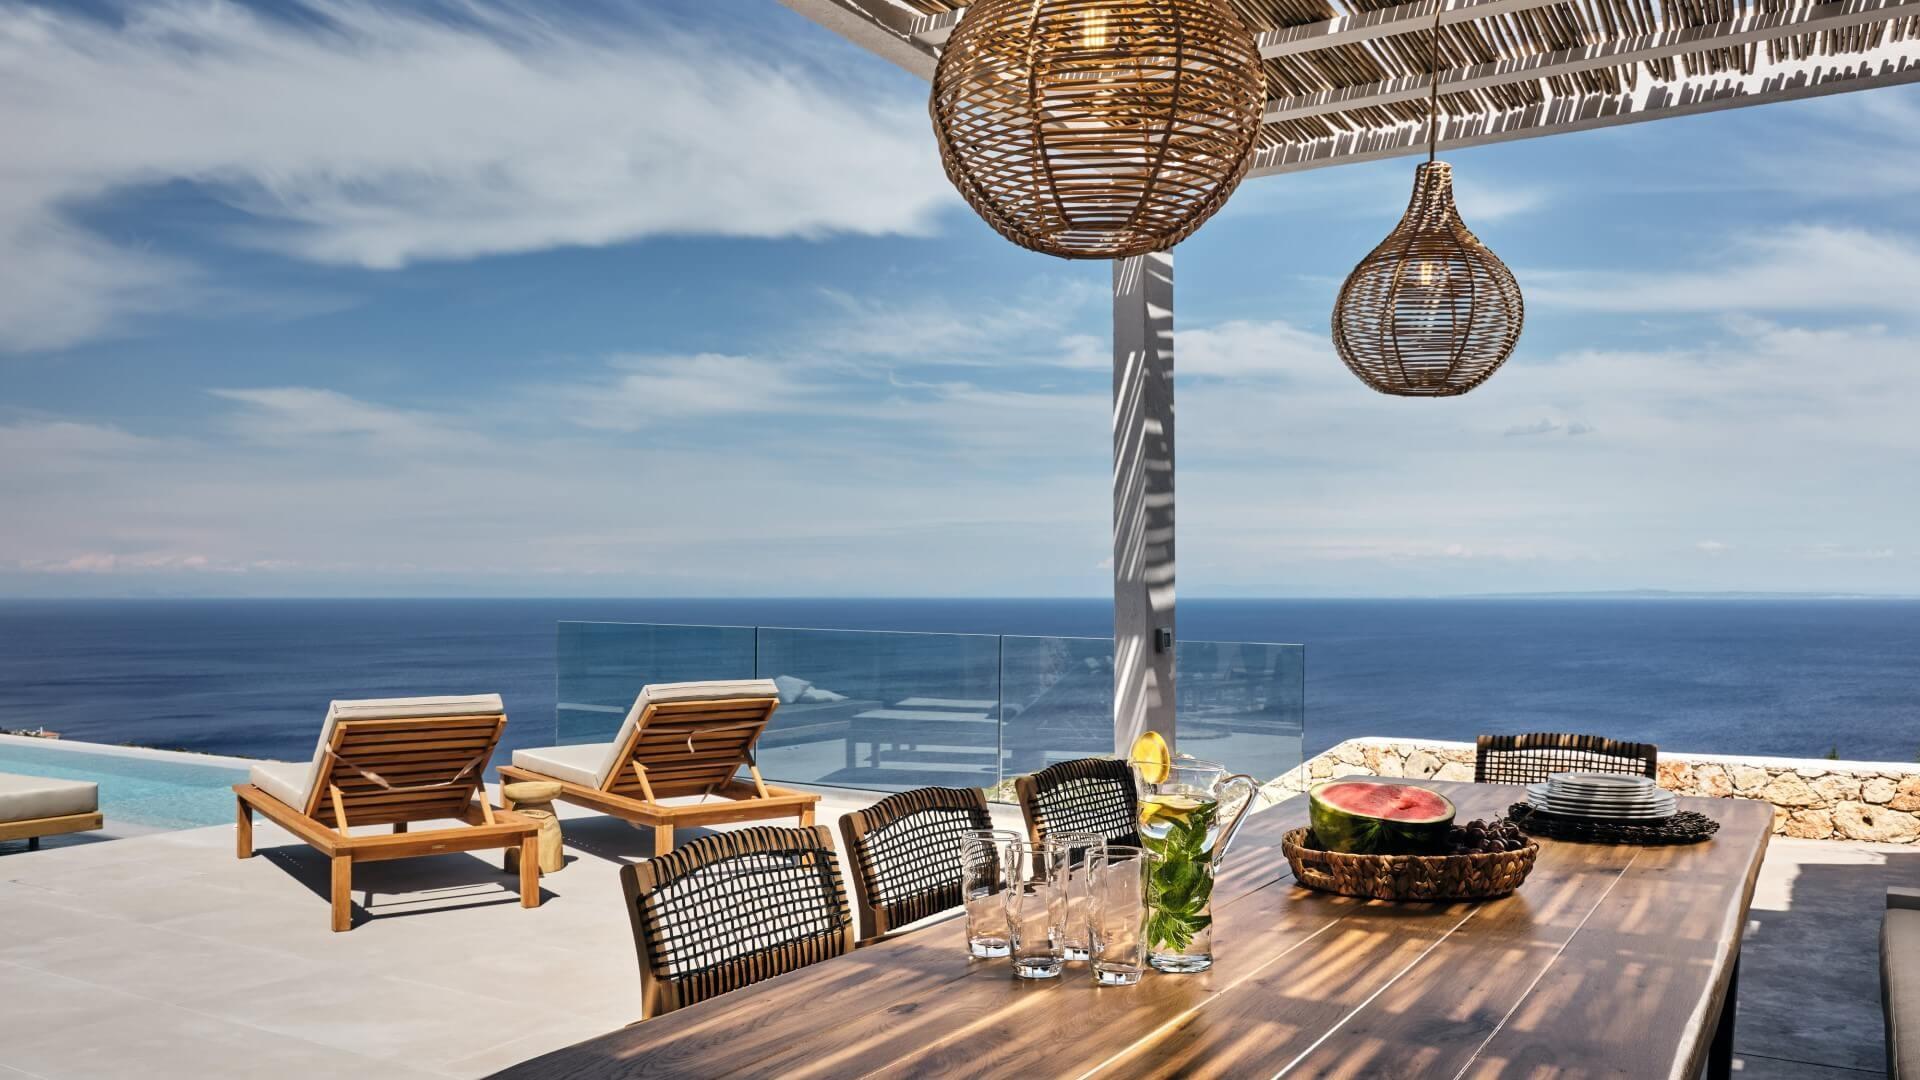 Etheria Luxury Villas & Suites Zante Zakynthos Greece